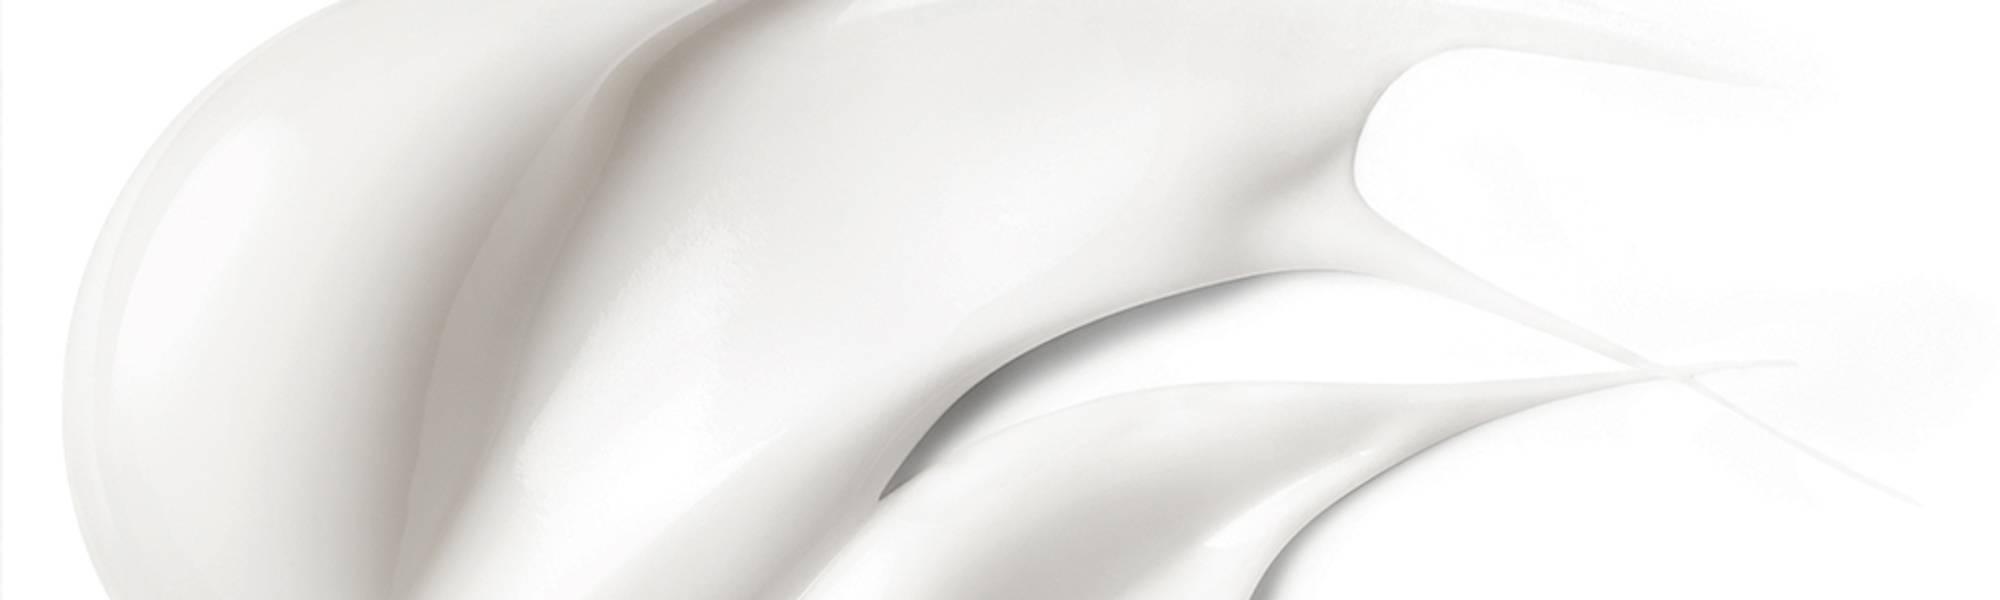 Larocheposay ArticlePage Eczema Best eczema cream